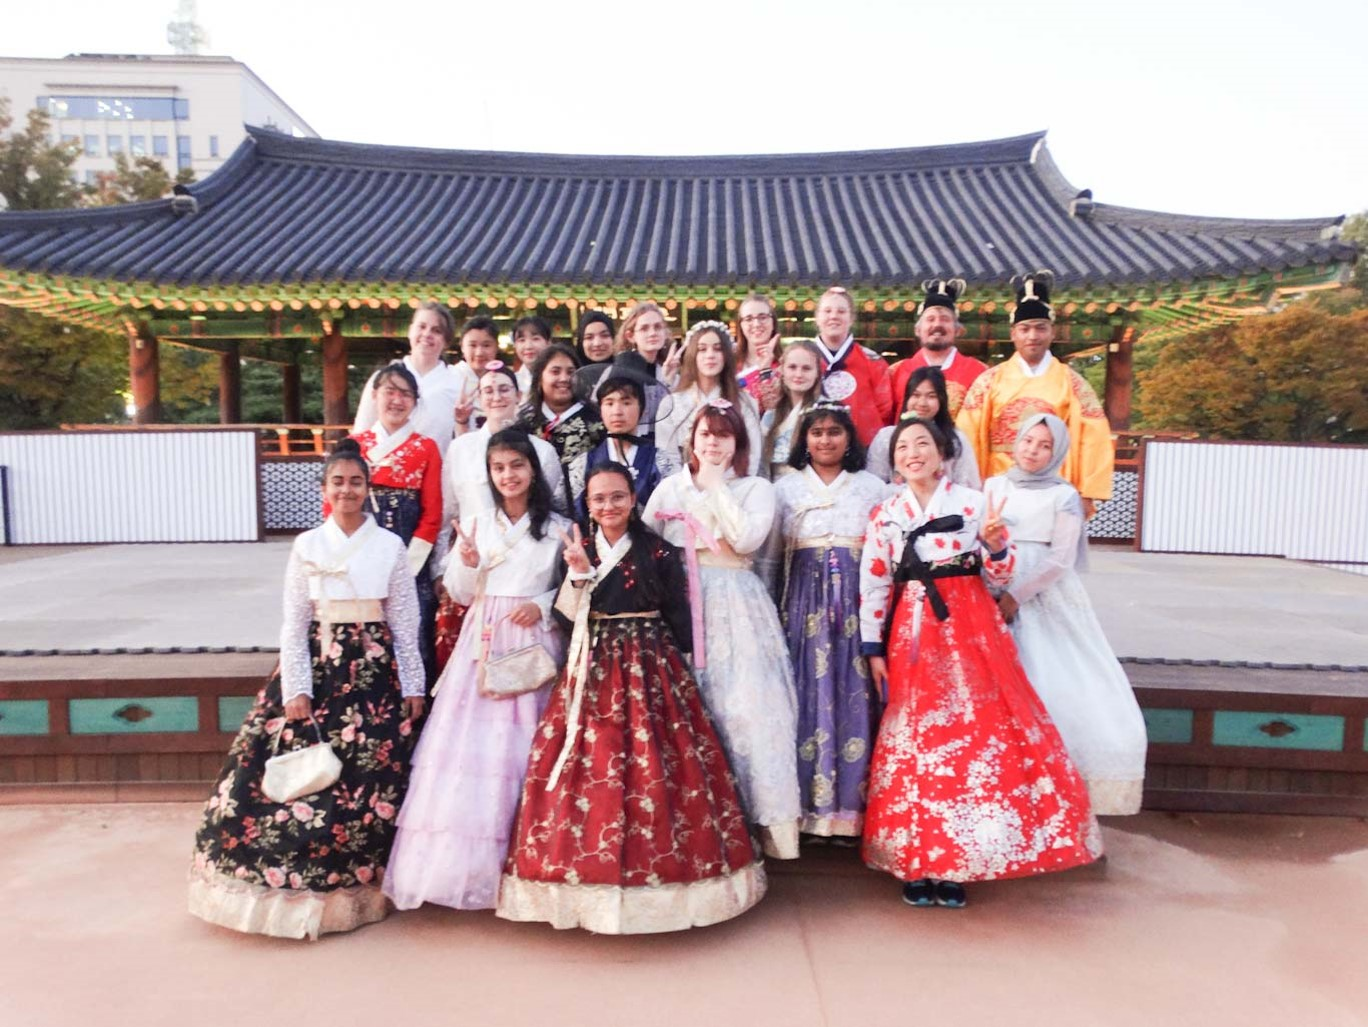 entry-976-group_hanbok